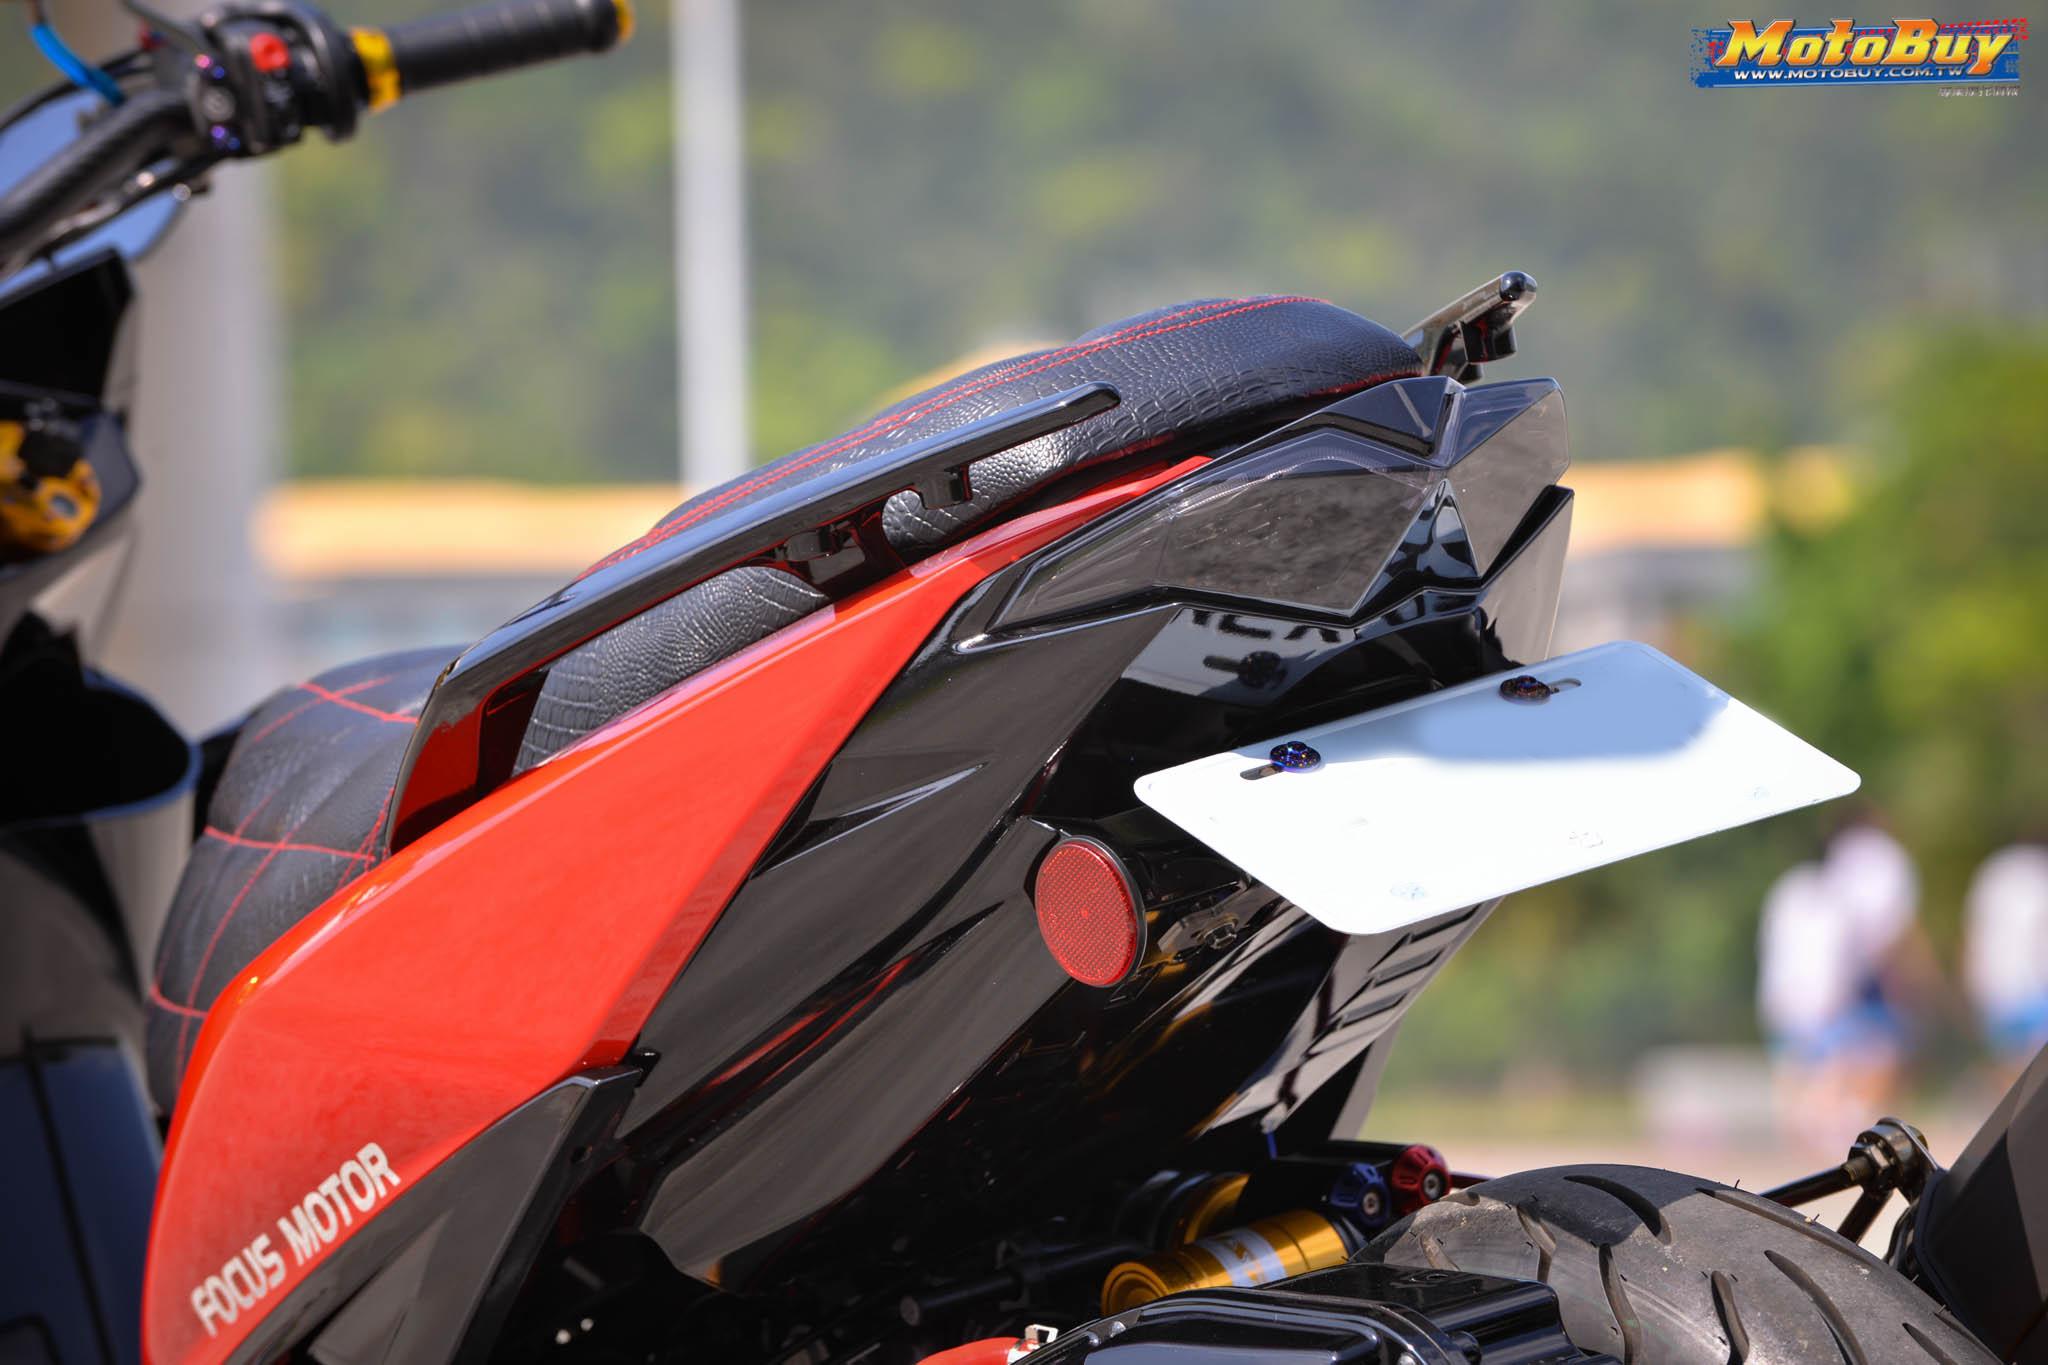 [夯車分享] 燃燒吧!火鳥~ - YAMAHA FORCE 155   MotoBuy